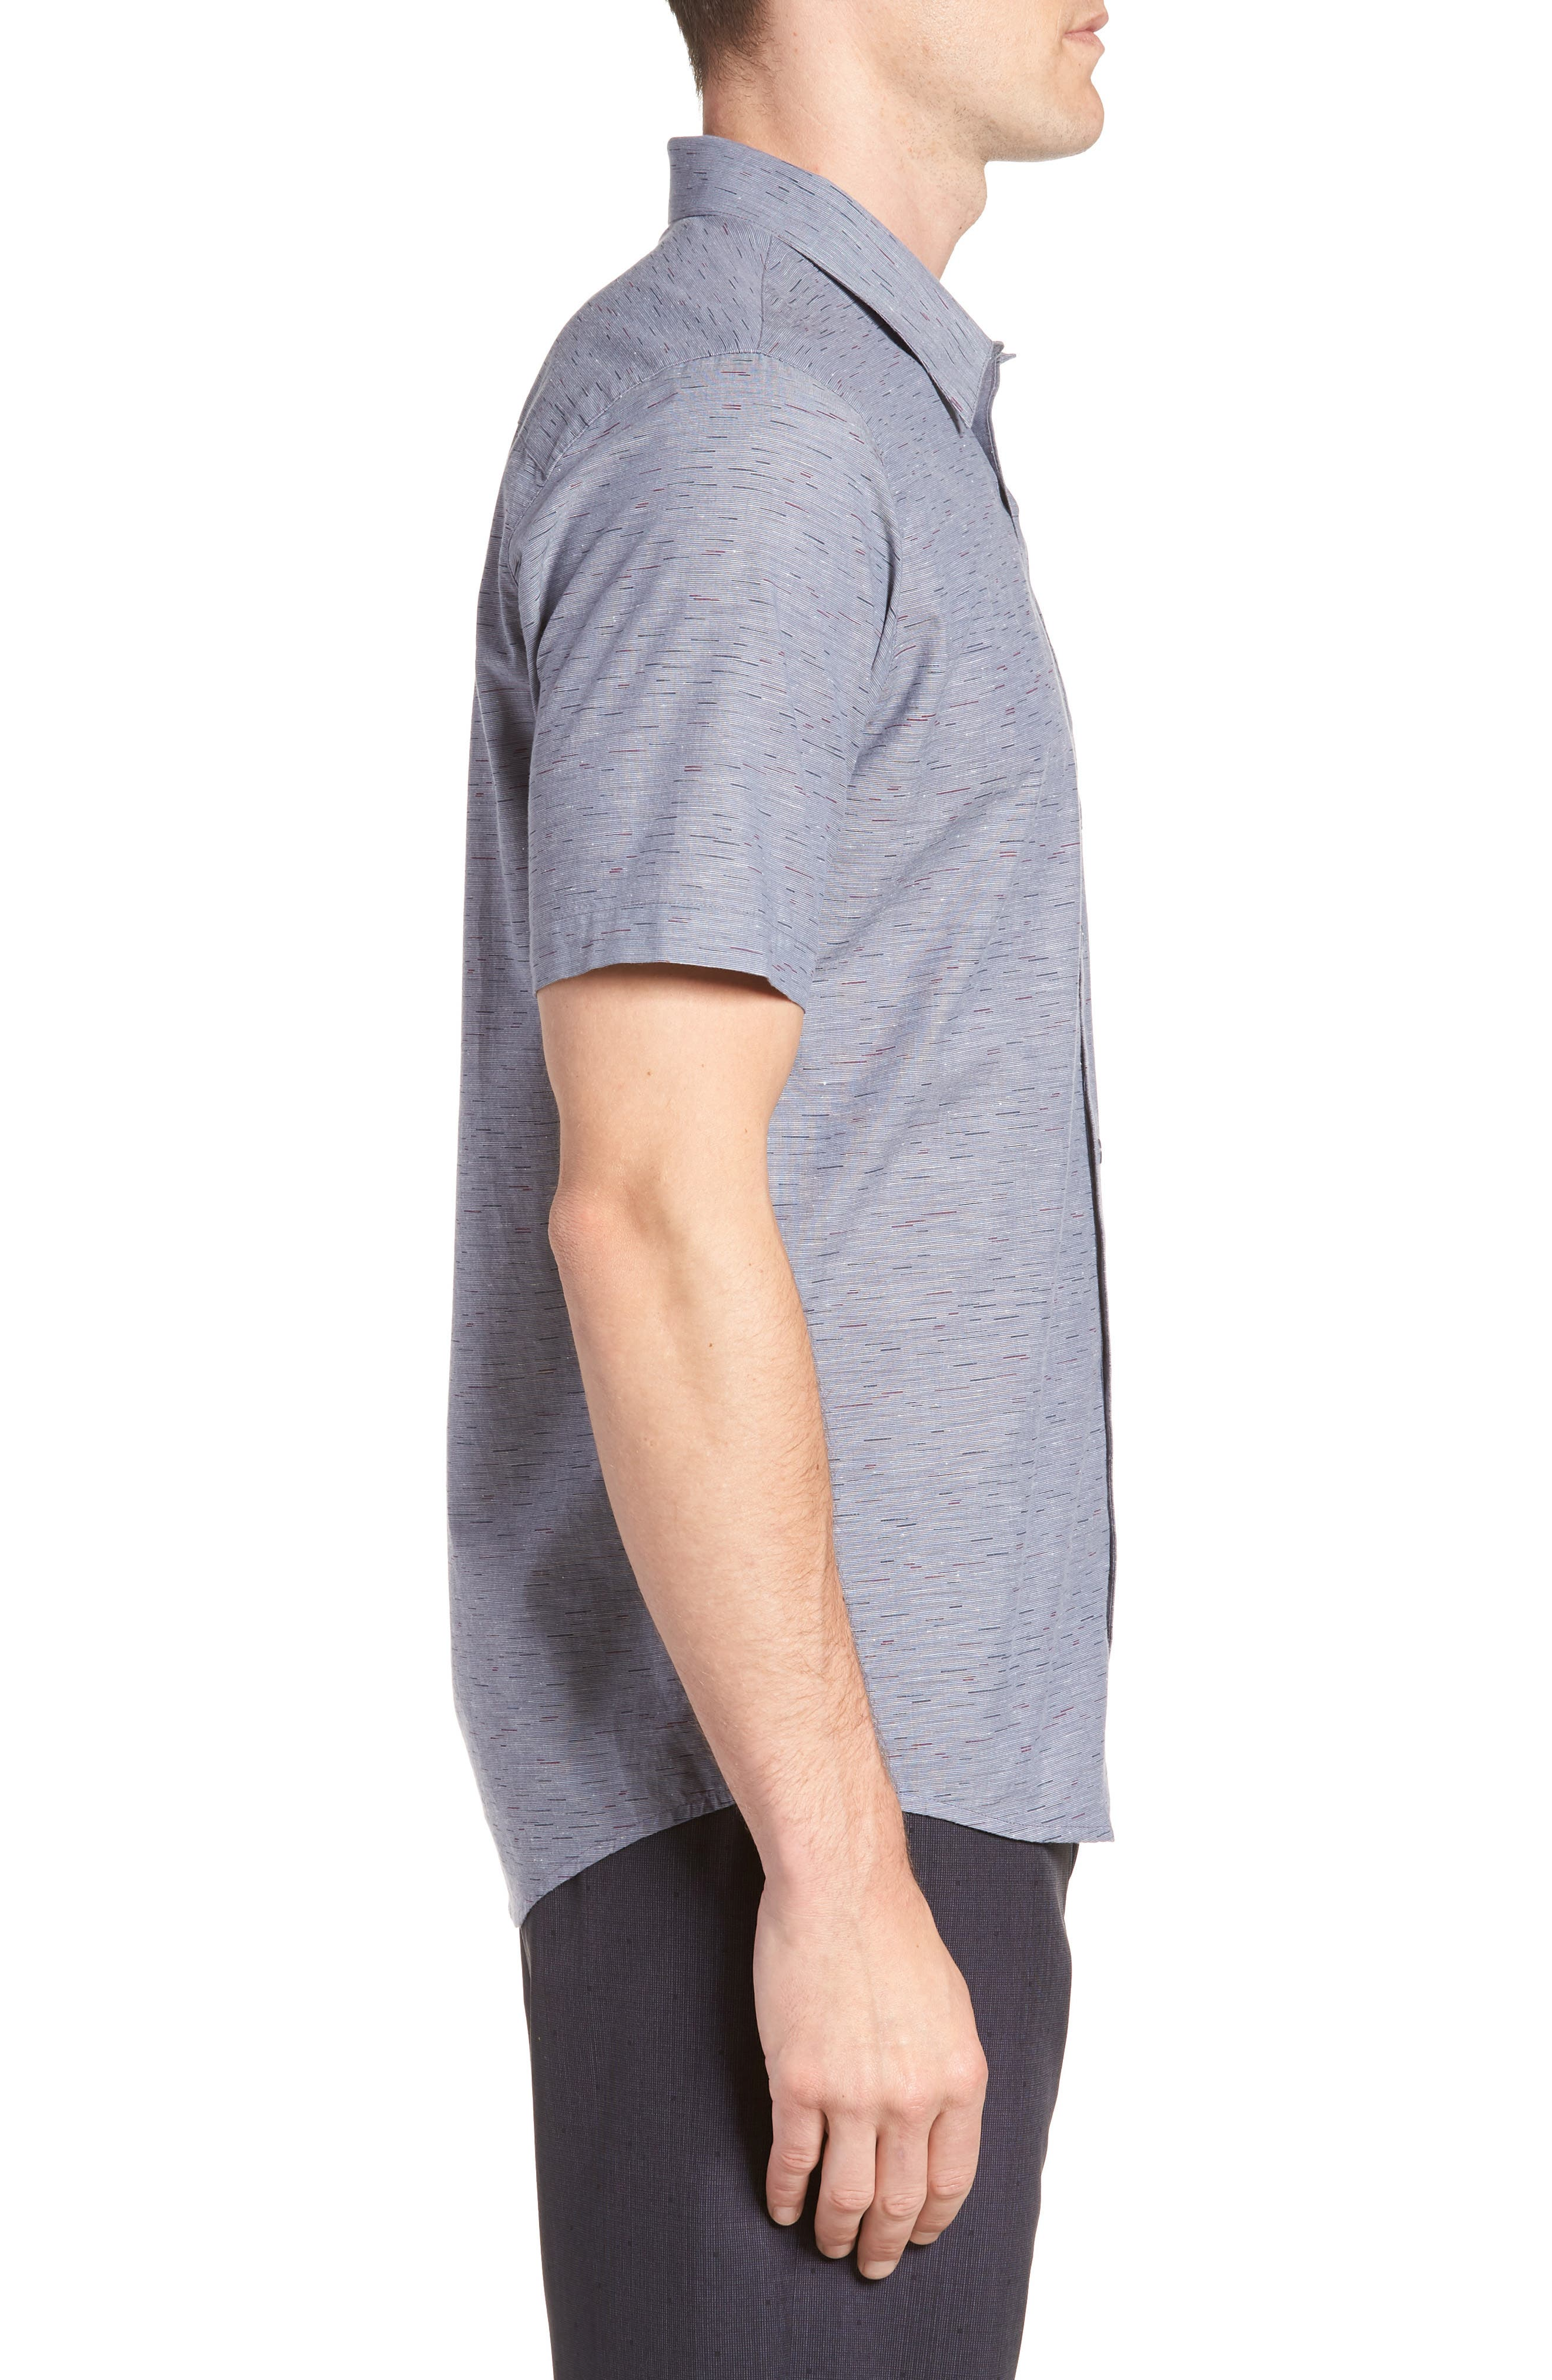 Stacoto Regular Fit Sport Shirt,                             Alternate thumbnail 4, color,                             Heather Alloy